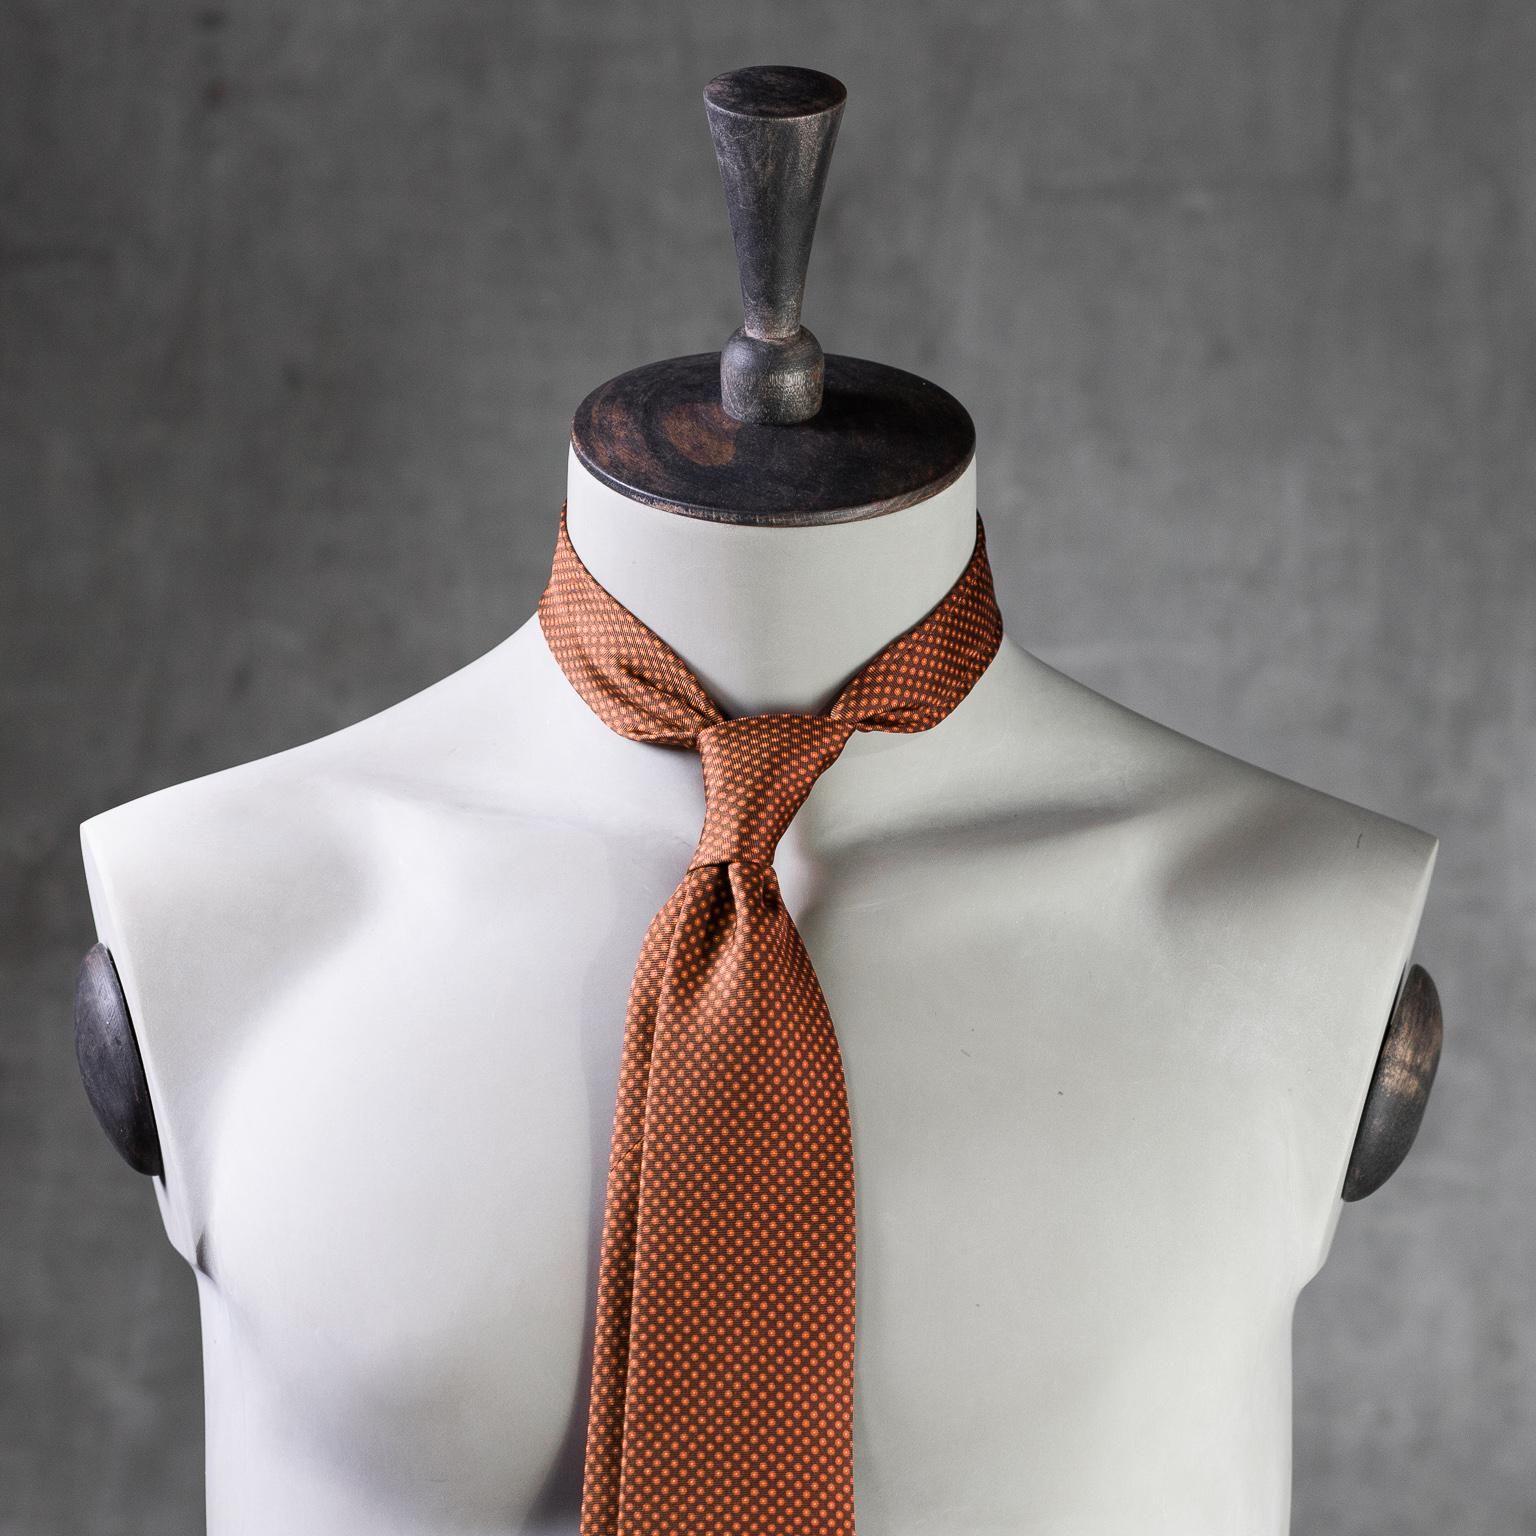 PRINTED SILK SEDA ESTAMPADA-0568-Tie-Initials-Corbata-Iniciales-The Seëlk-2